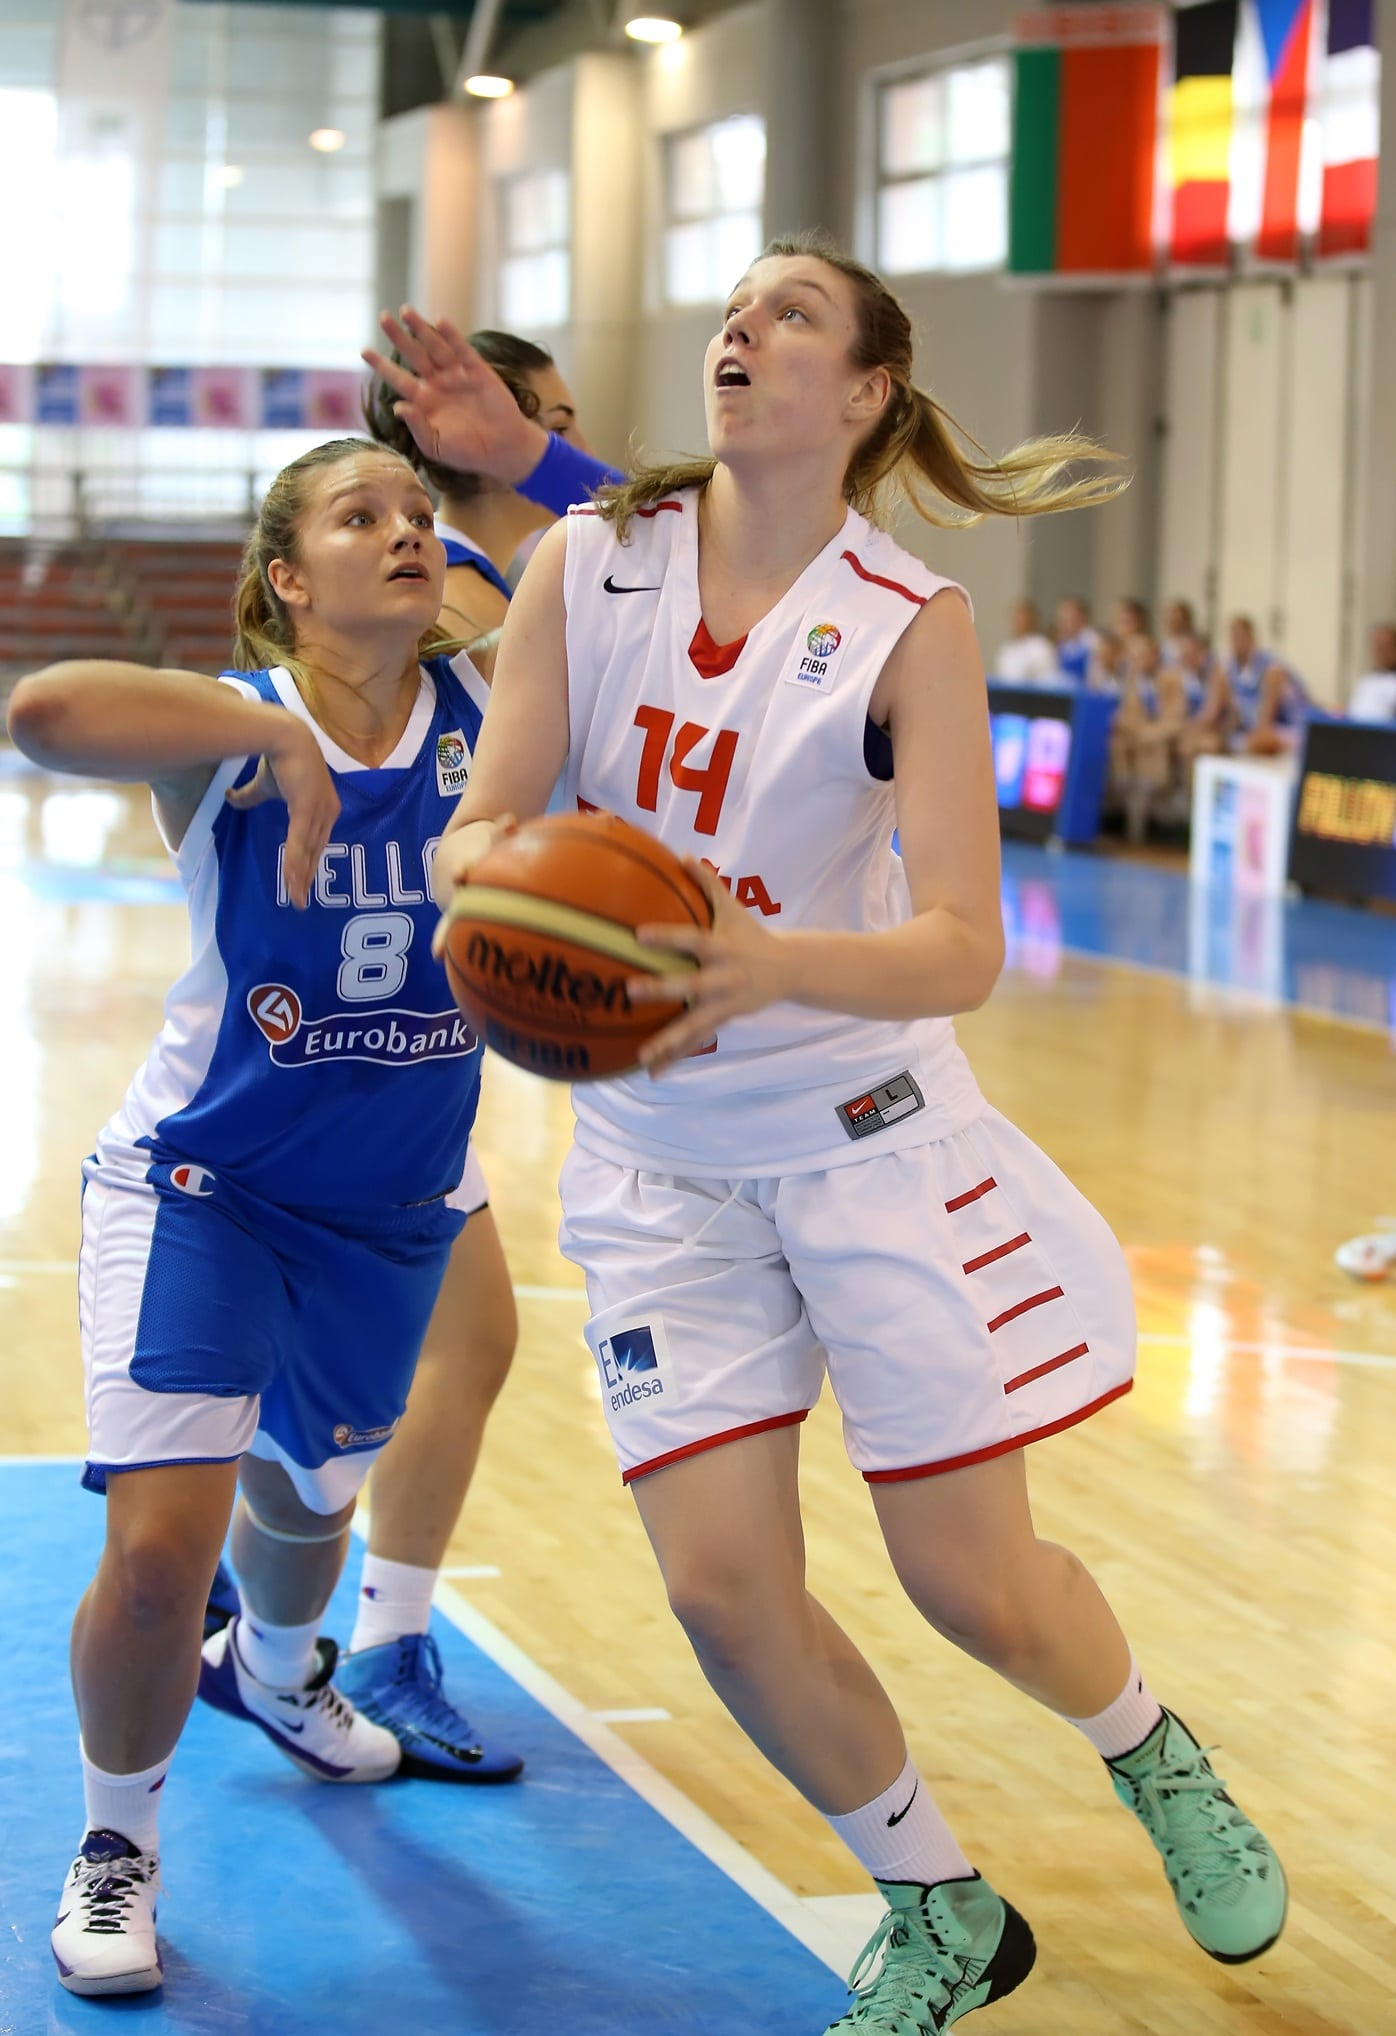 Sara Zaragoza contribuye a la victoria de la U20 frente a Grecia (55-38)